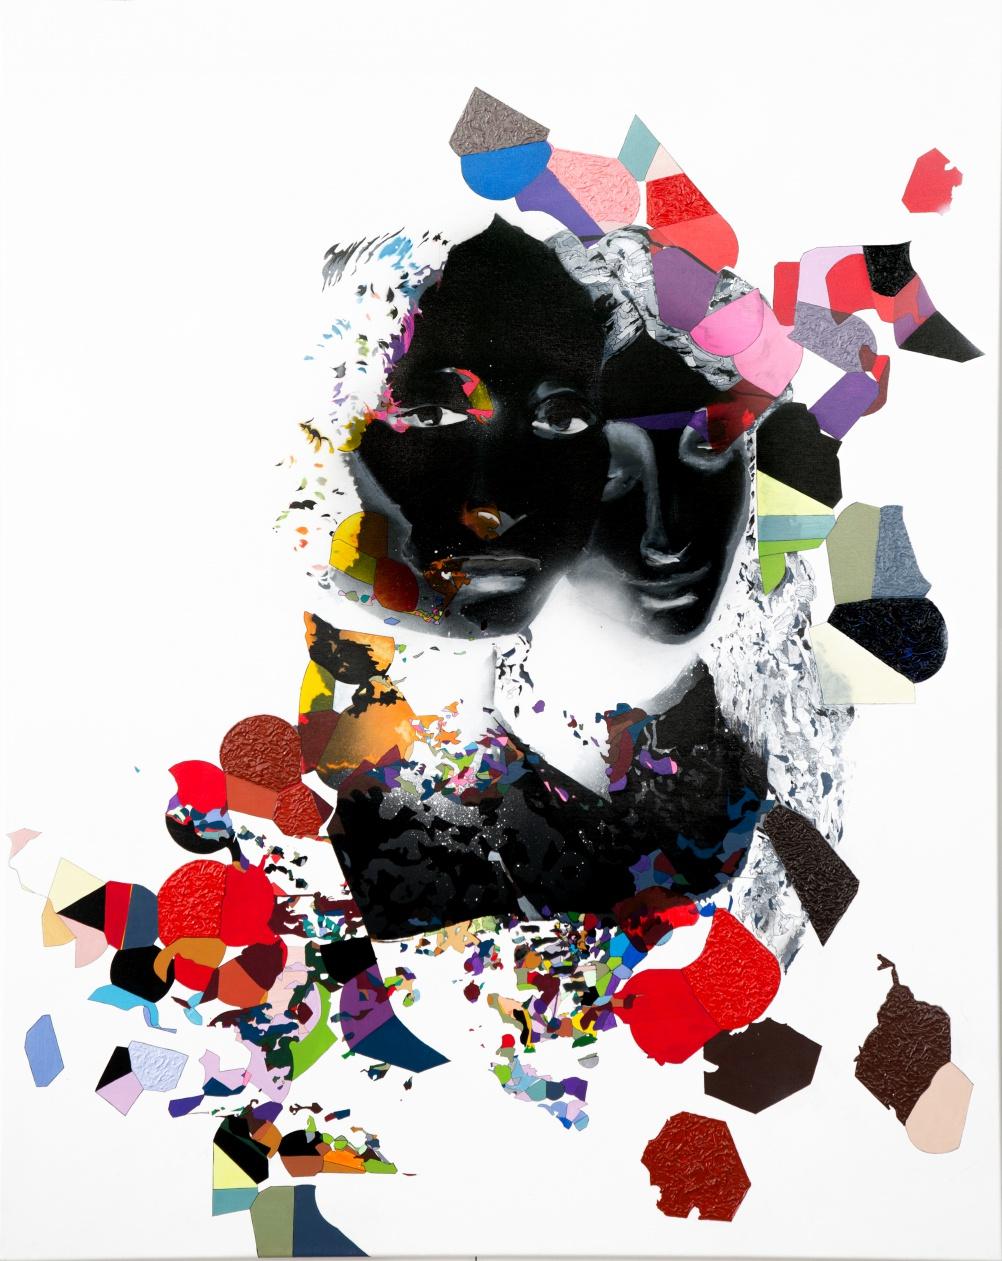 LEO DE MEDIO RUBI. Twice Half A Sister by Stephane Giner